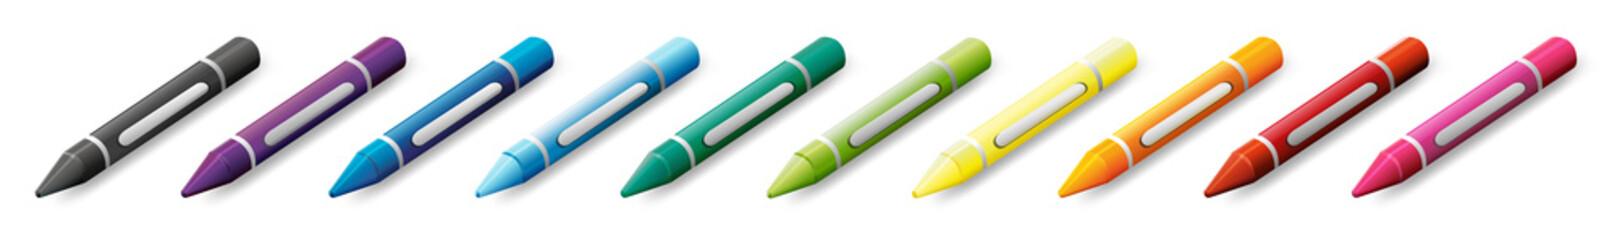 Ten colorful crayons